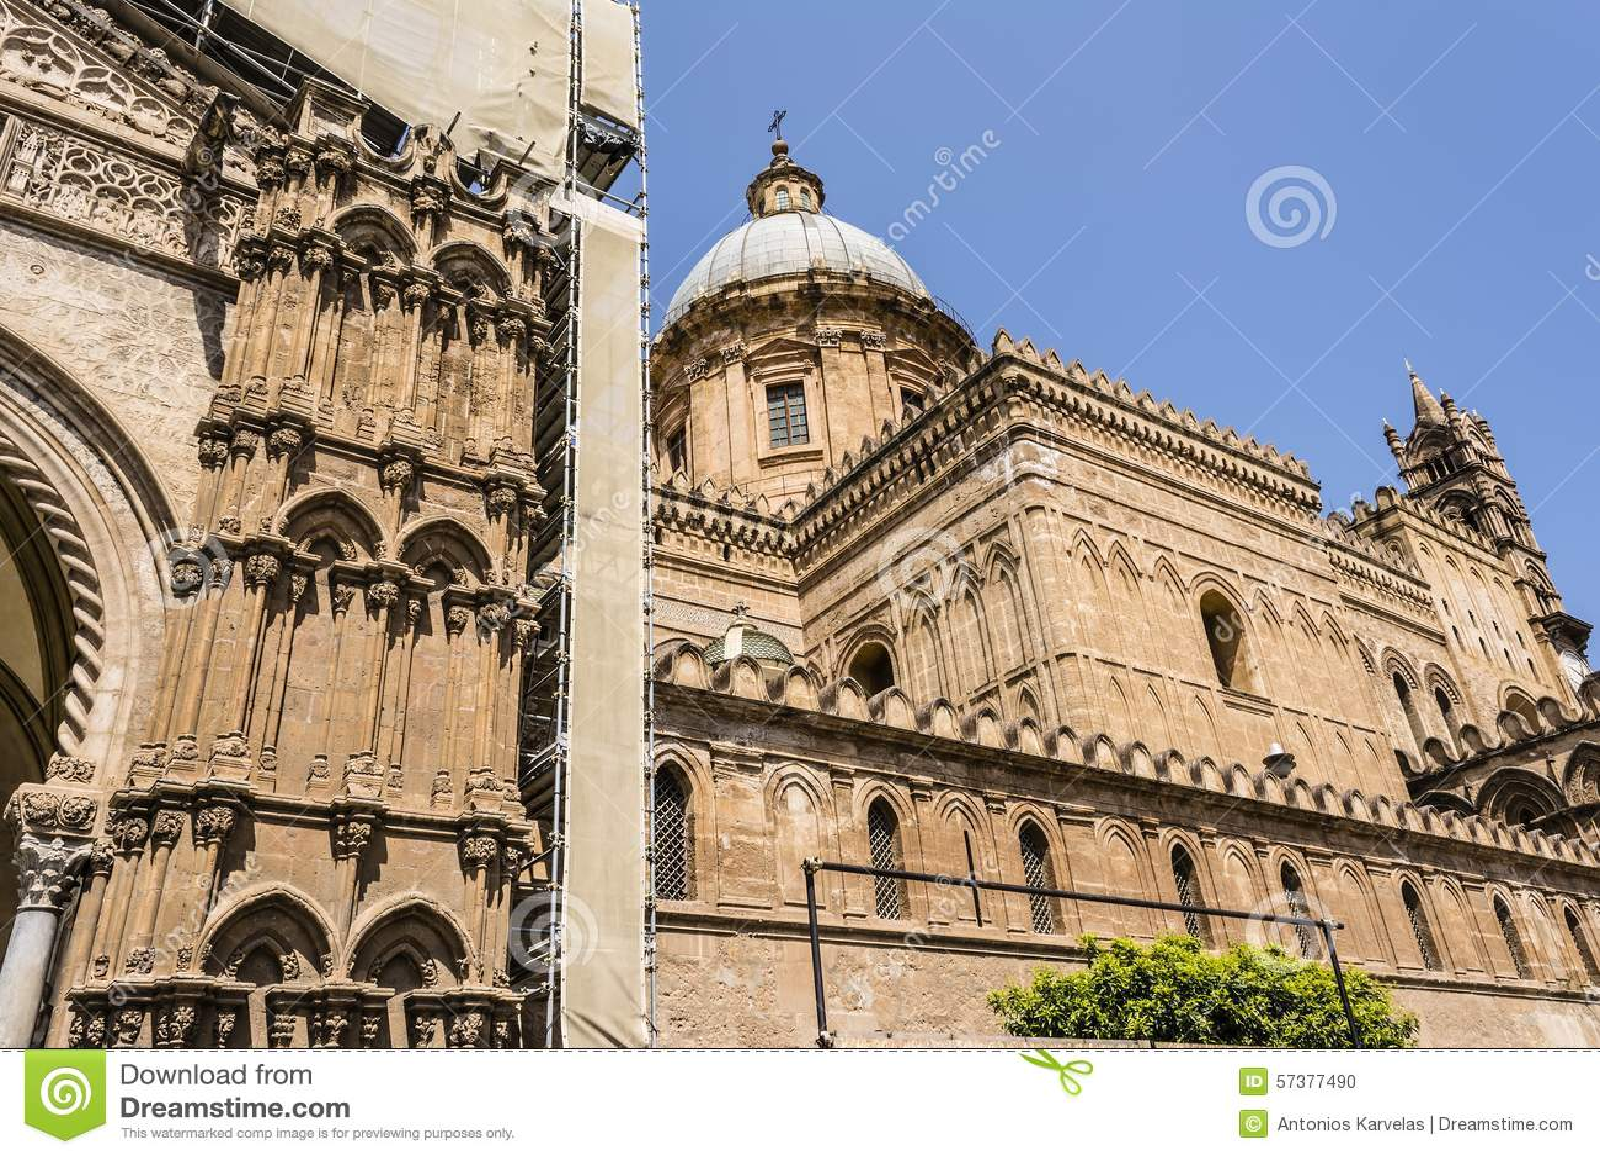 Kathedraal van Palermo in Sicilië, Italië